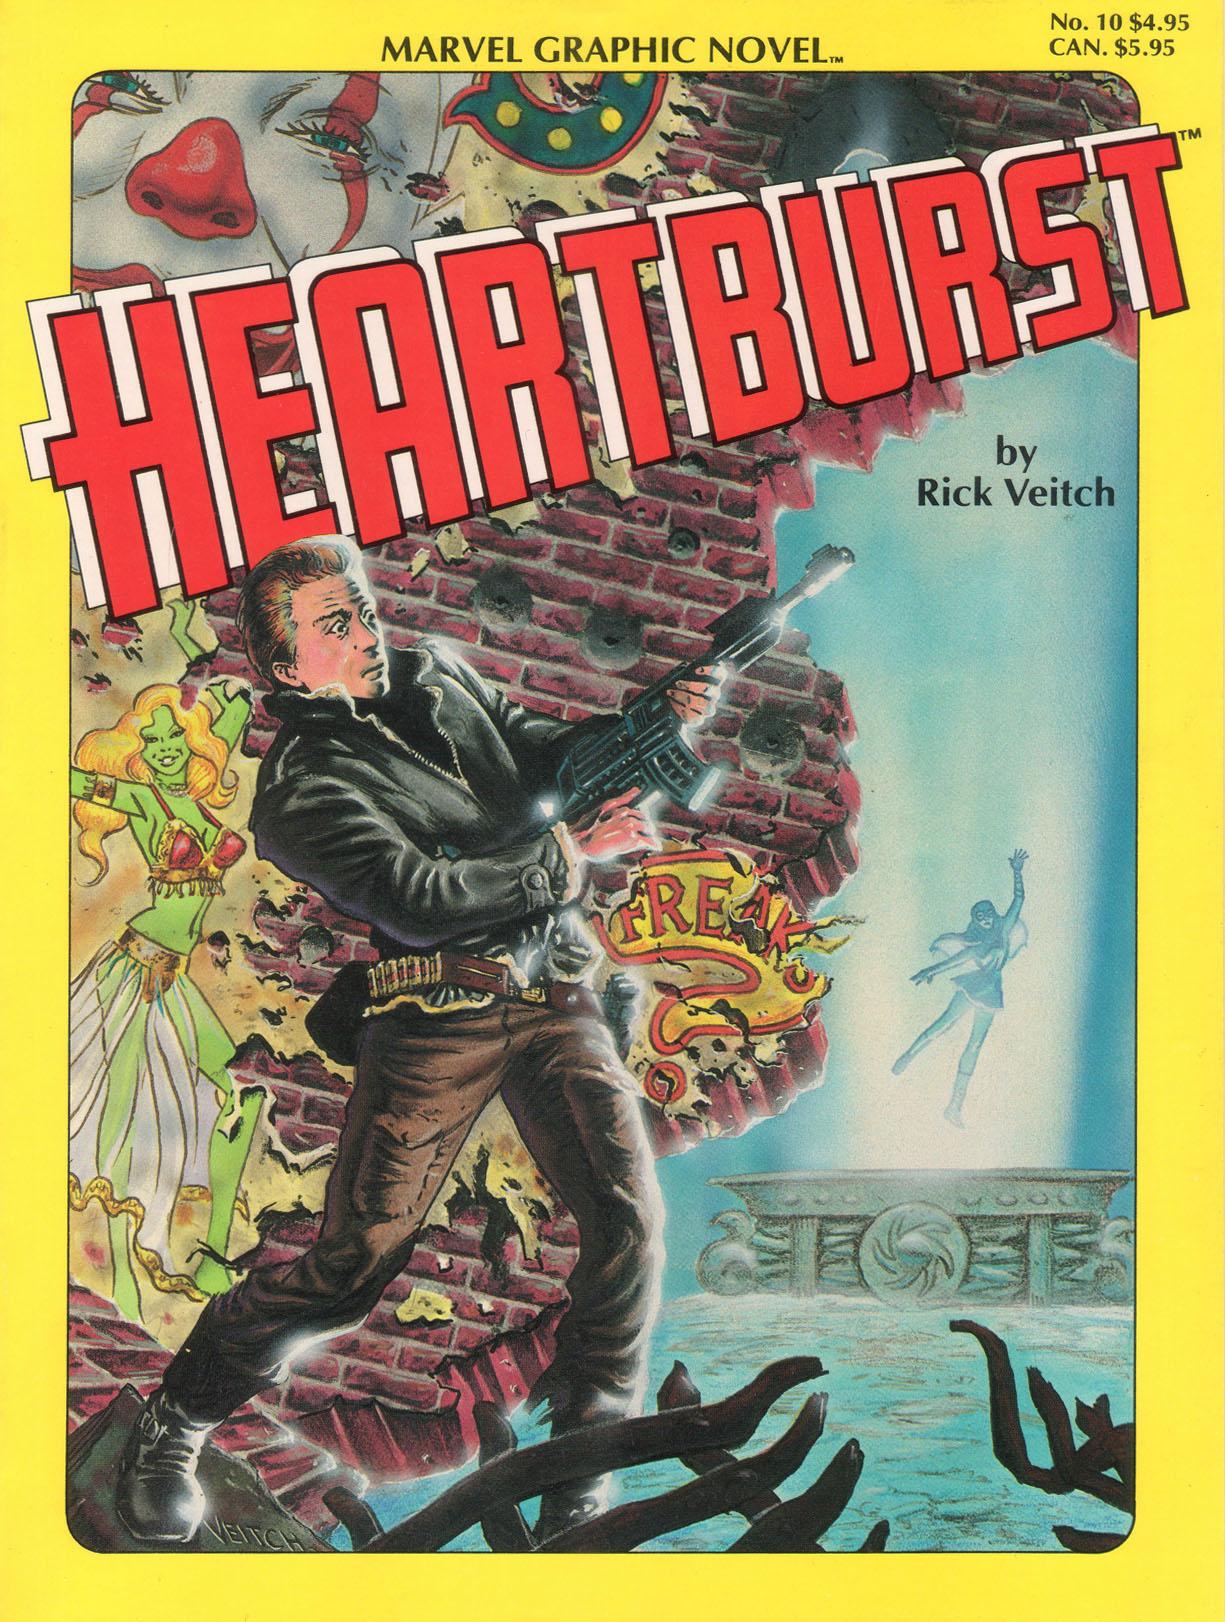 Marvel Graphic Novel 10_-_Heartburst Page 1